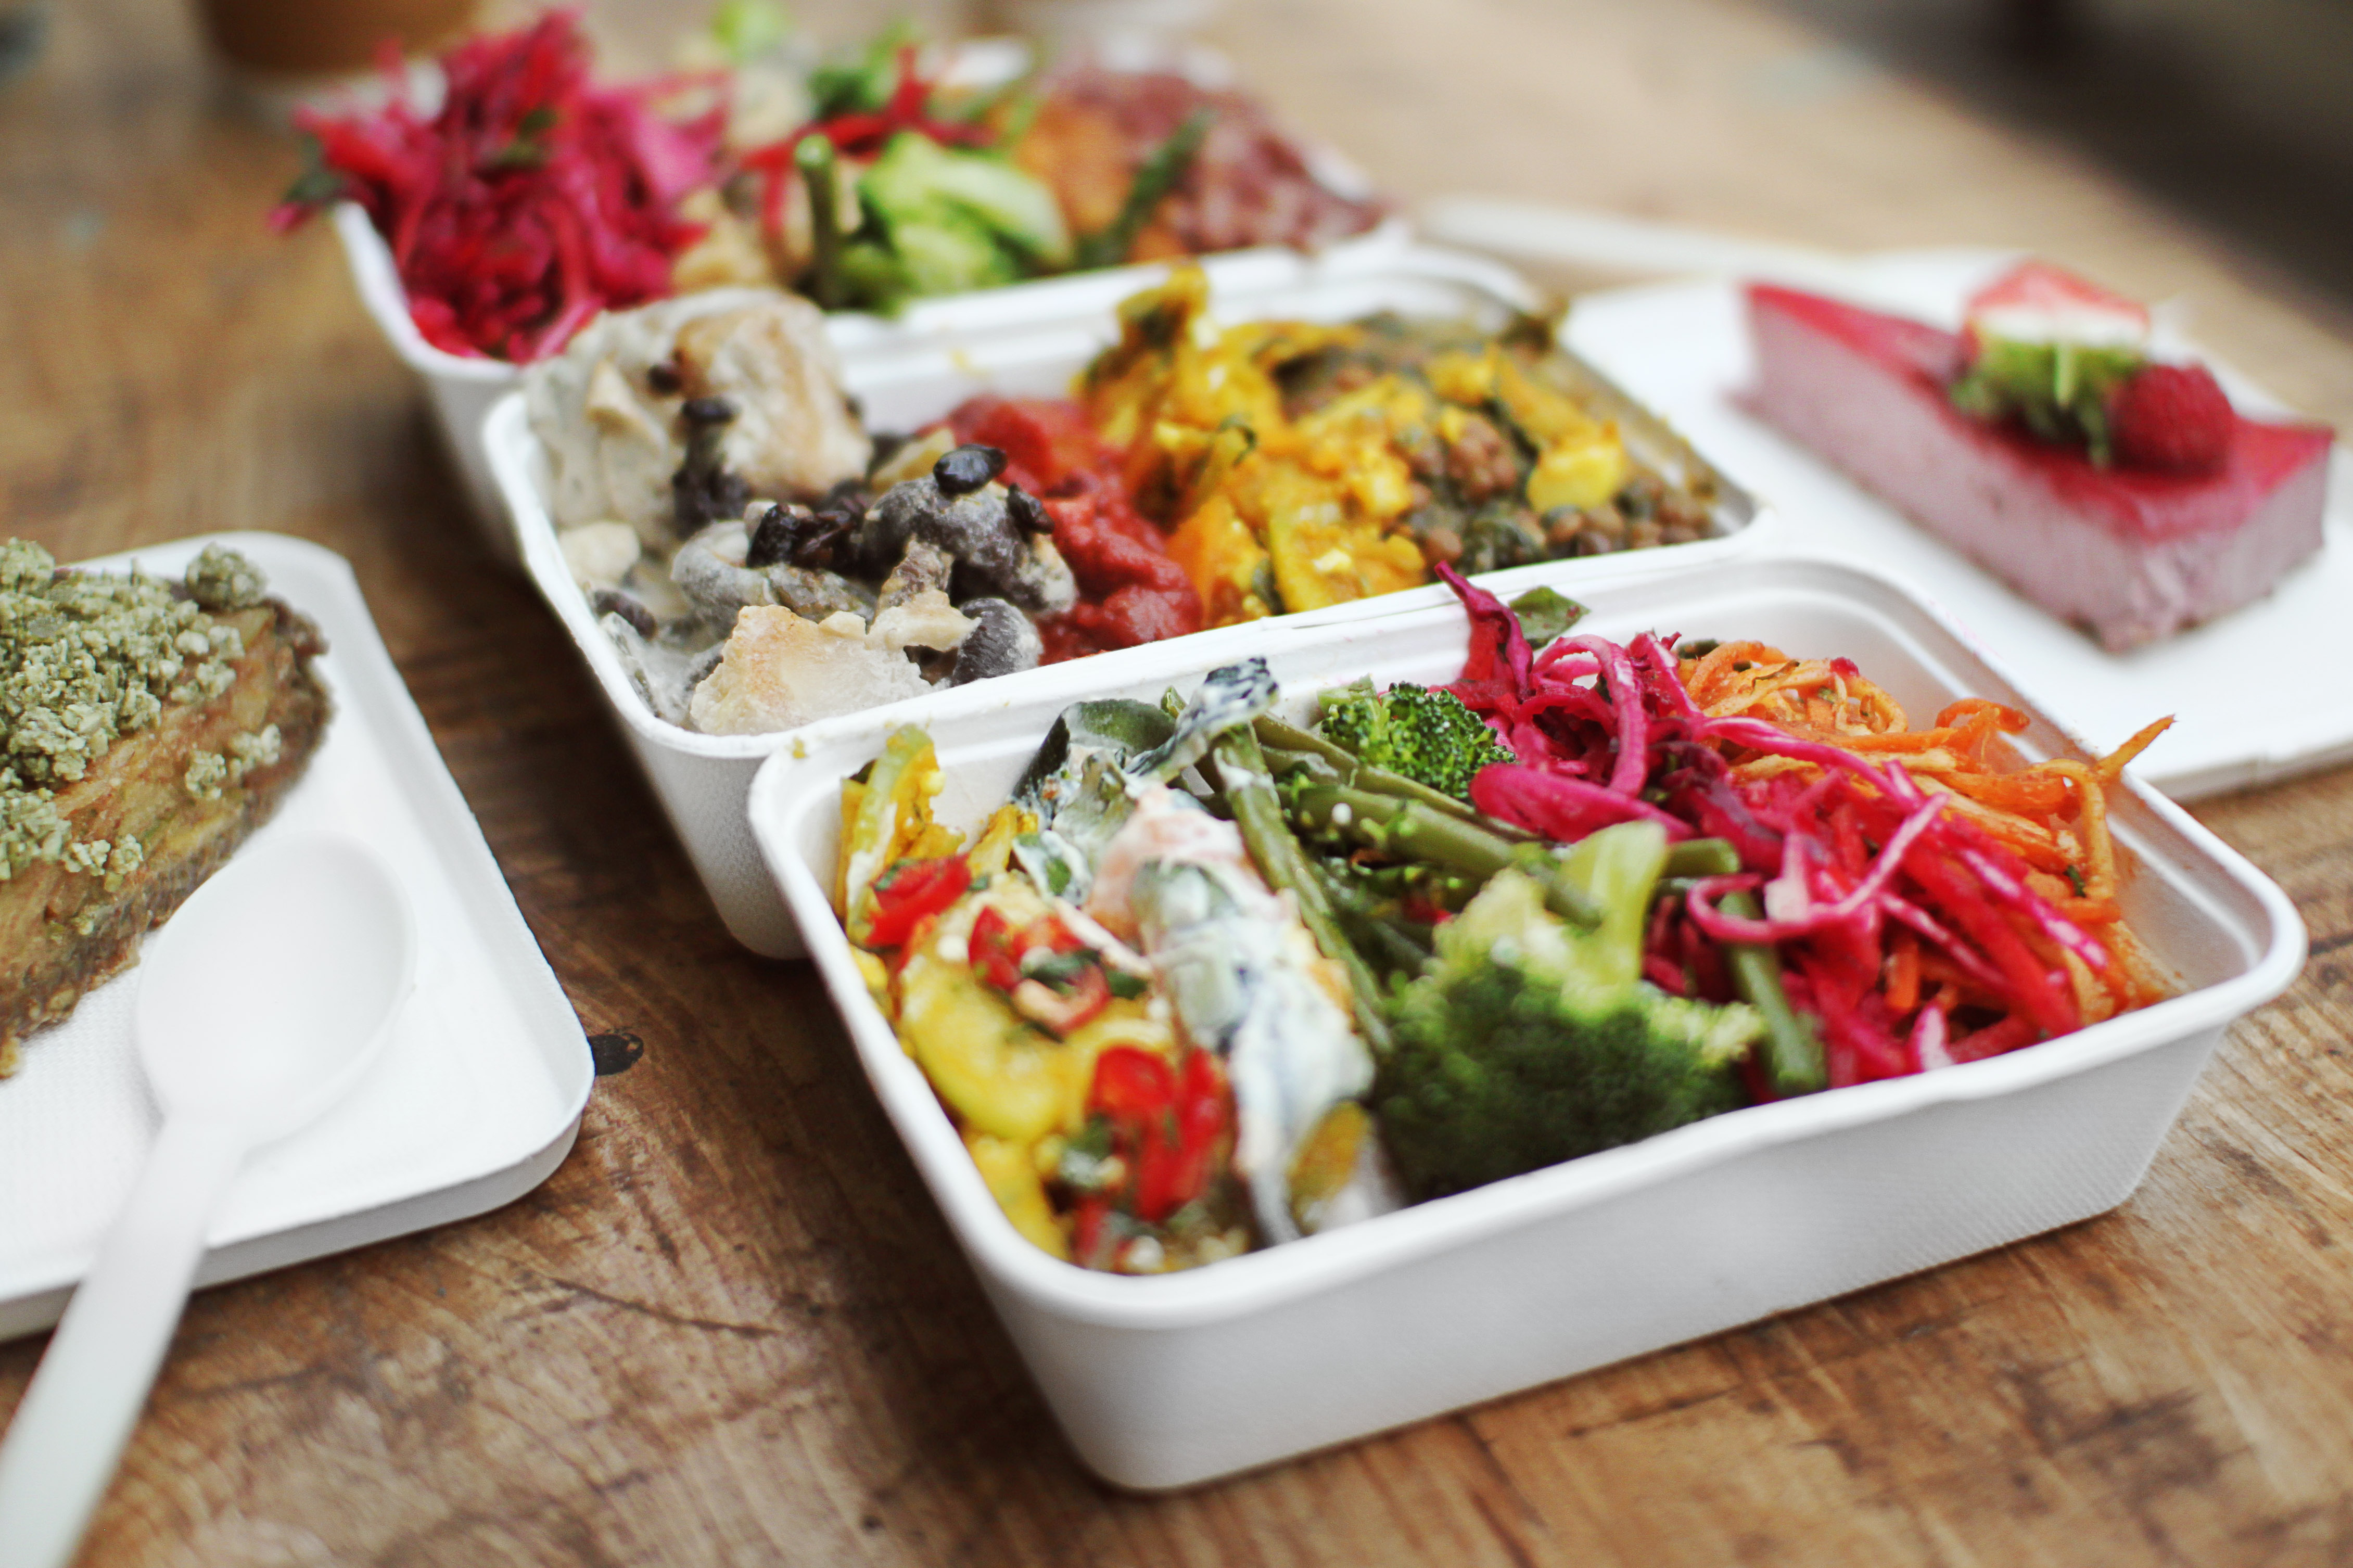 Vantra Eden - The Healthiest Restaurant In London? - The